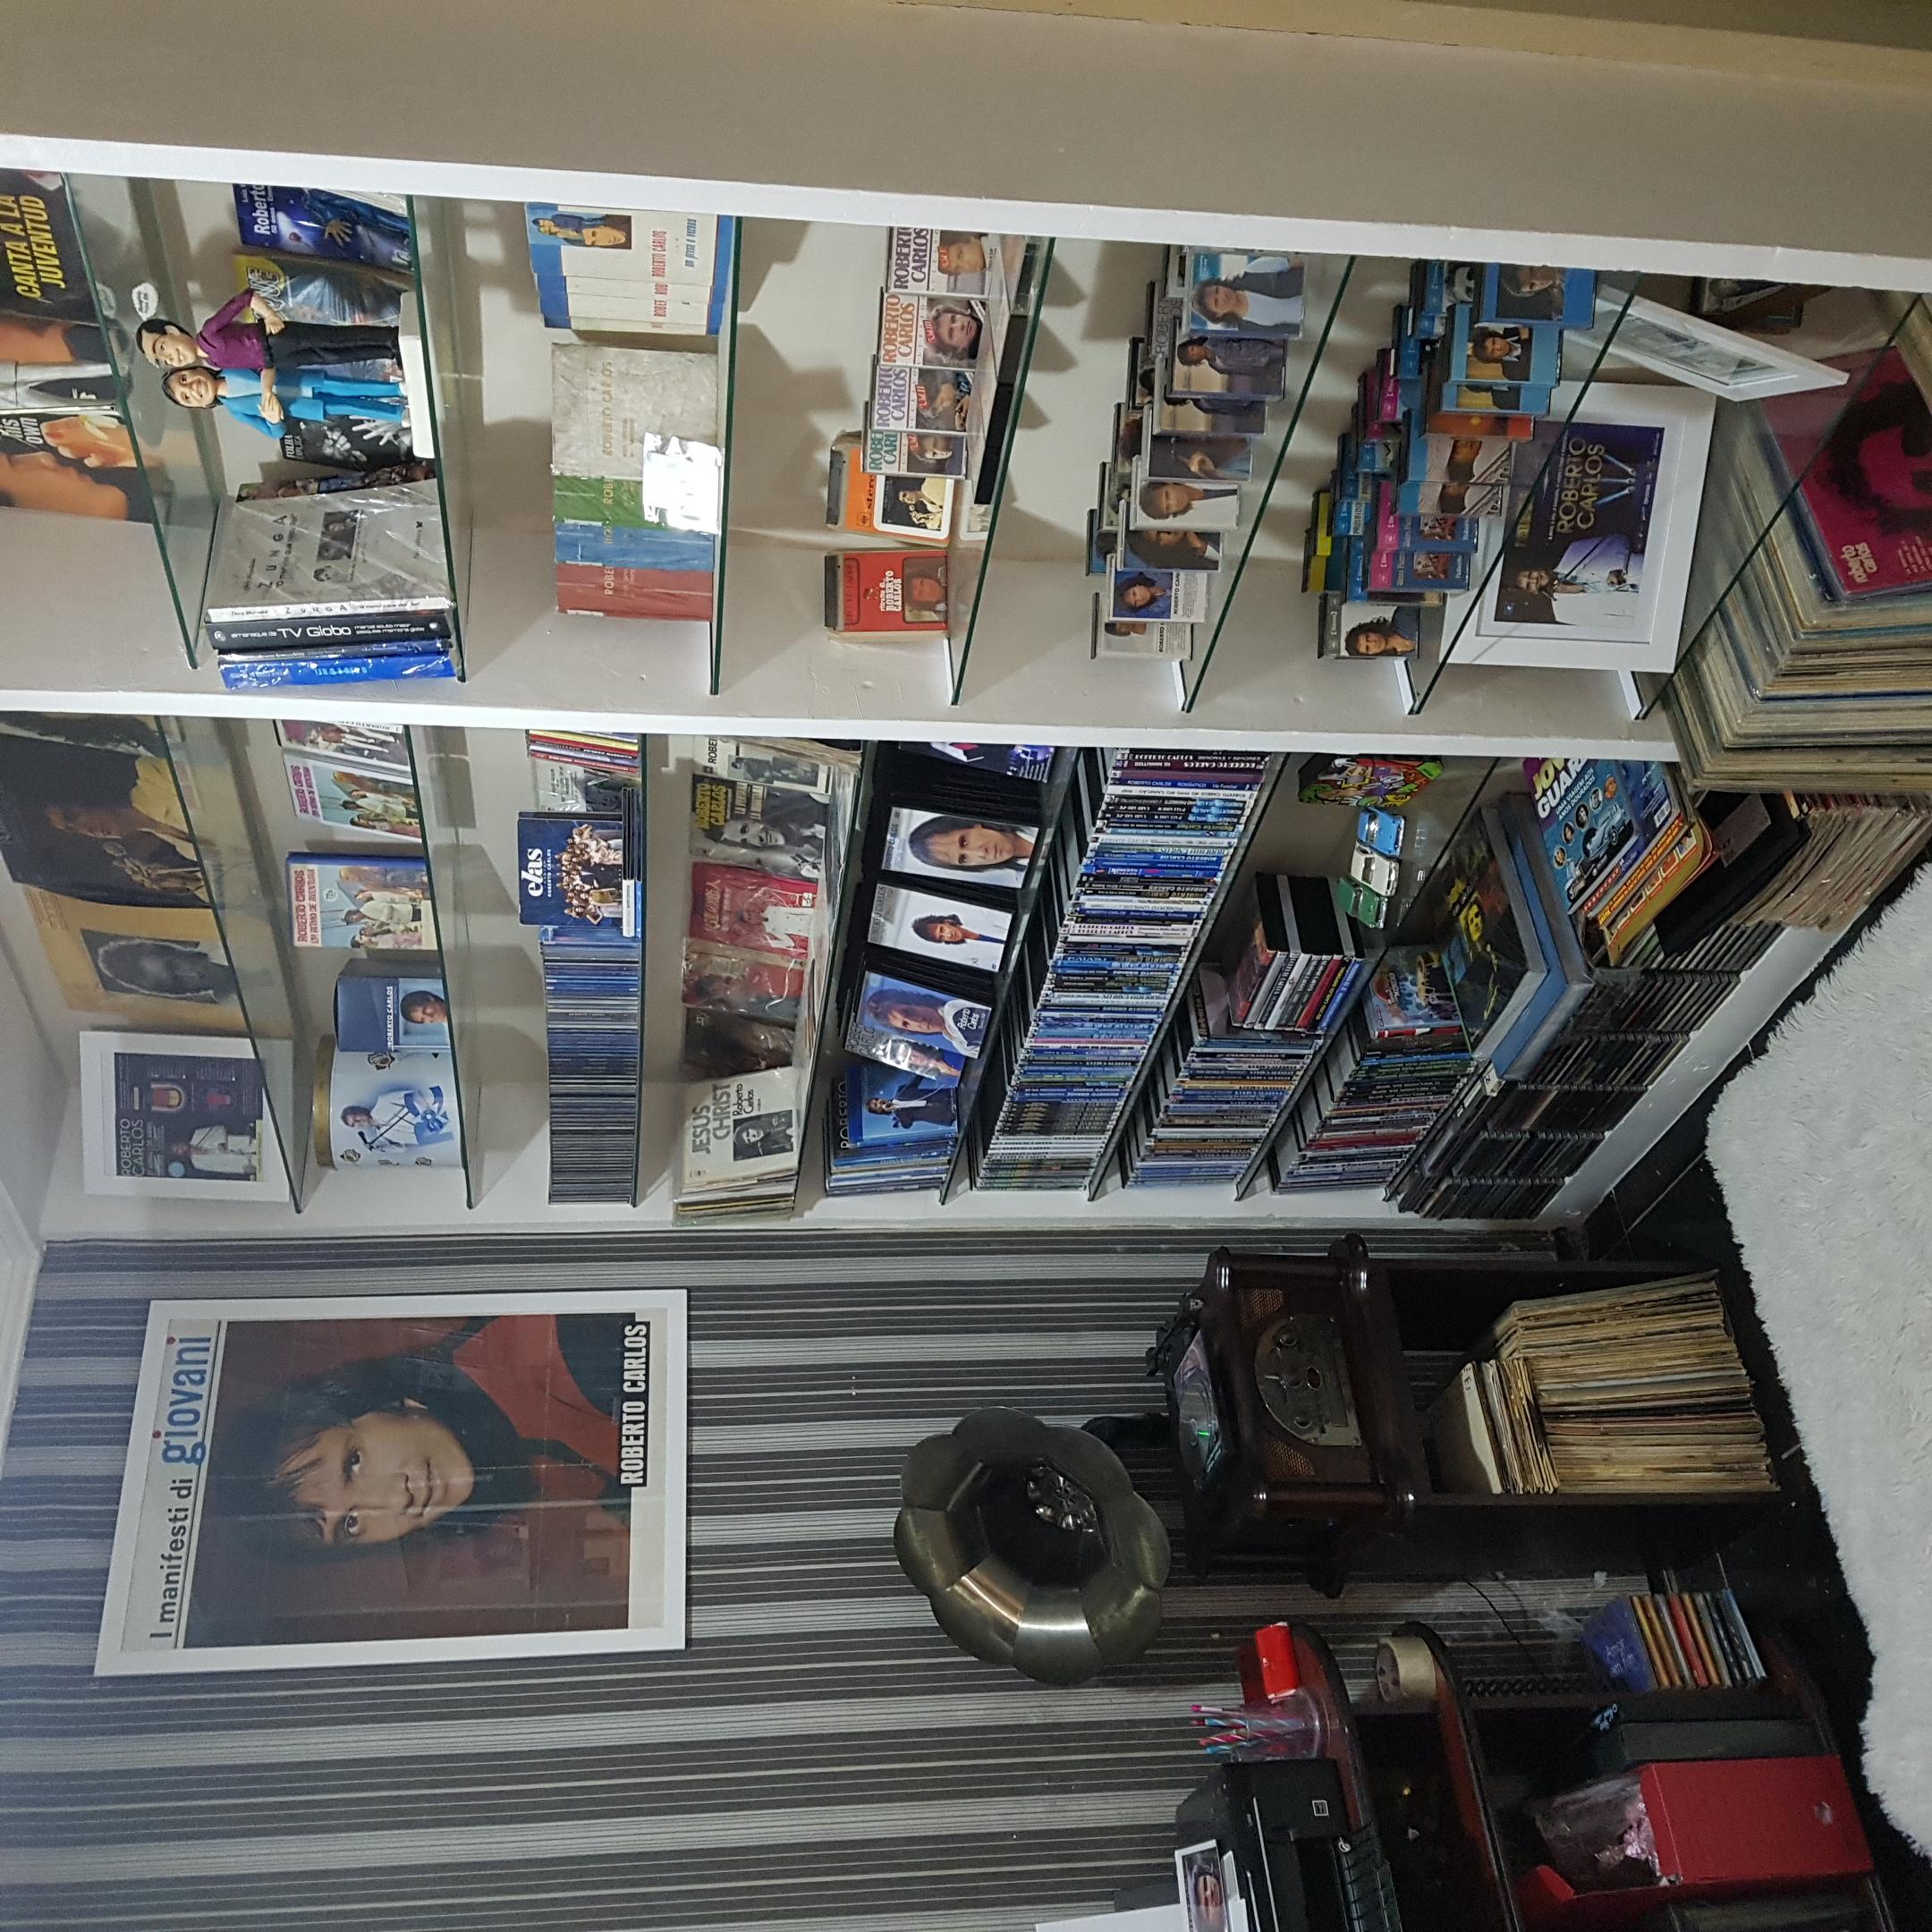 Francisco Ismael Salvador Rodrigues - Meu cantinho RC. Livros, lps, CDs, DVDs, k7, etc.